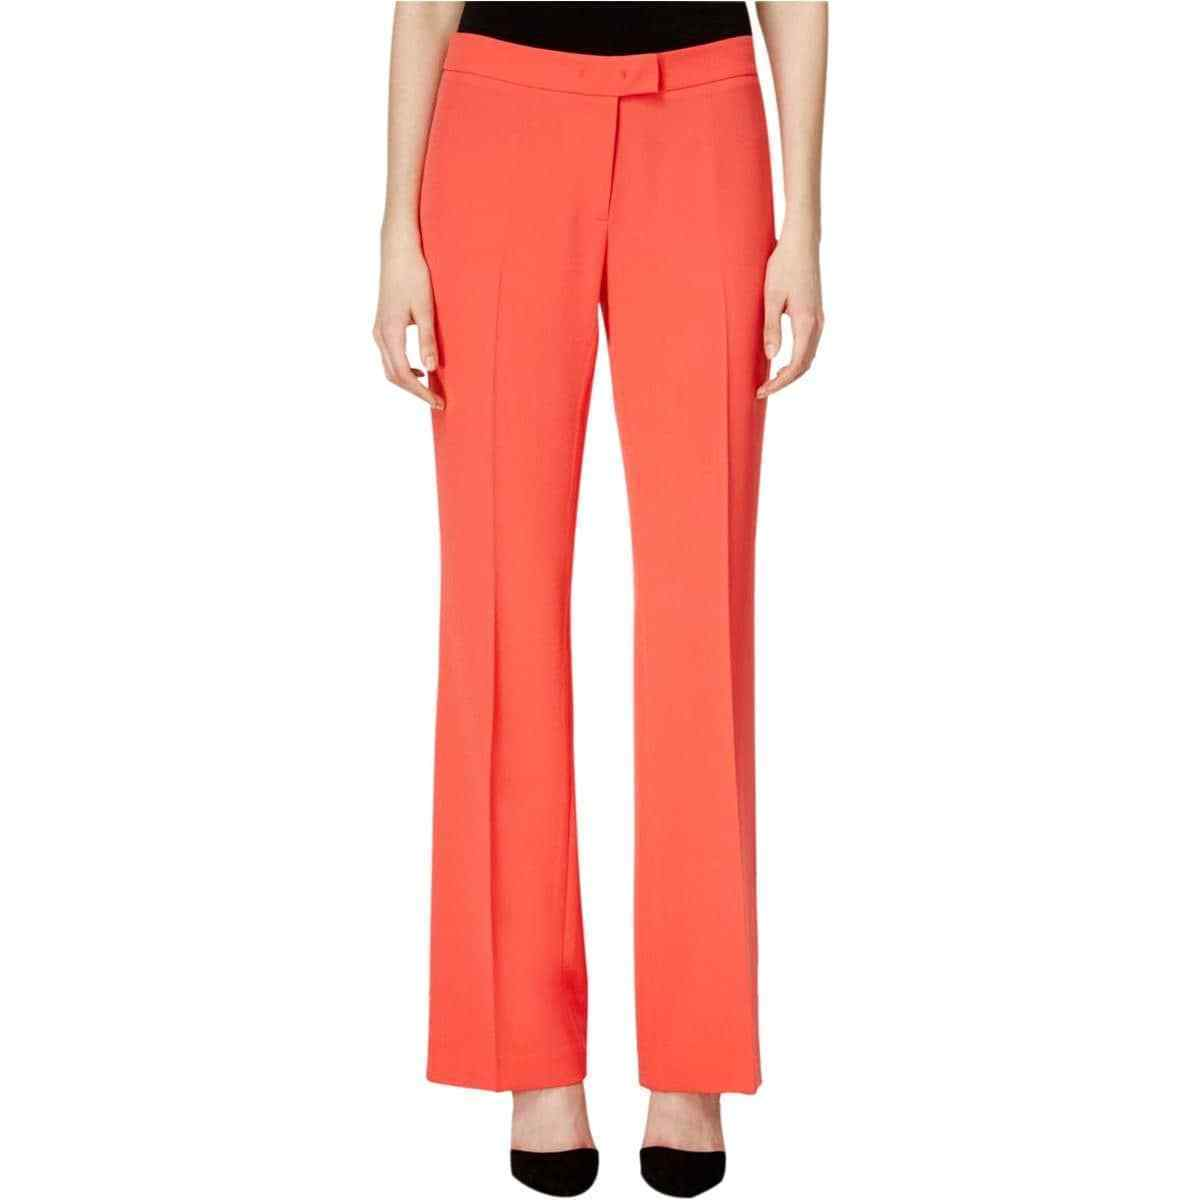 6970-2    Anne Klein Women's Dress Pant, Red, 2  $79